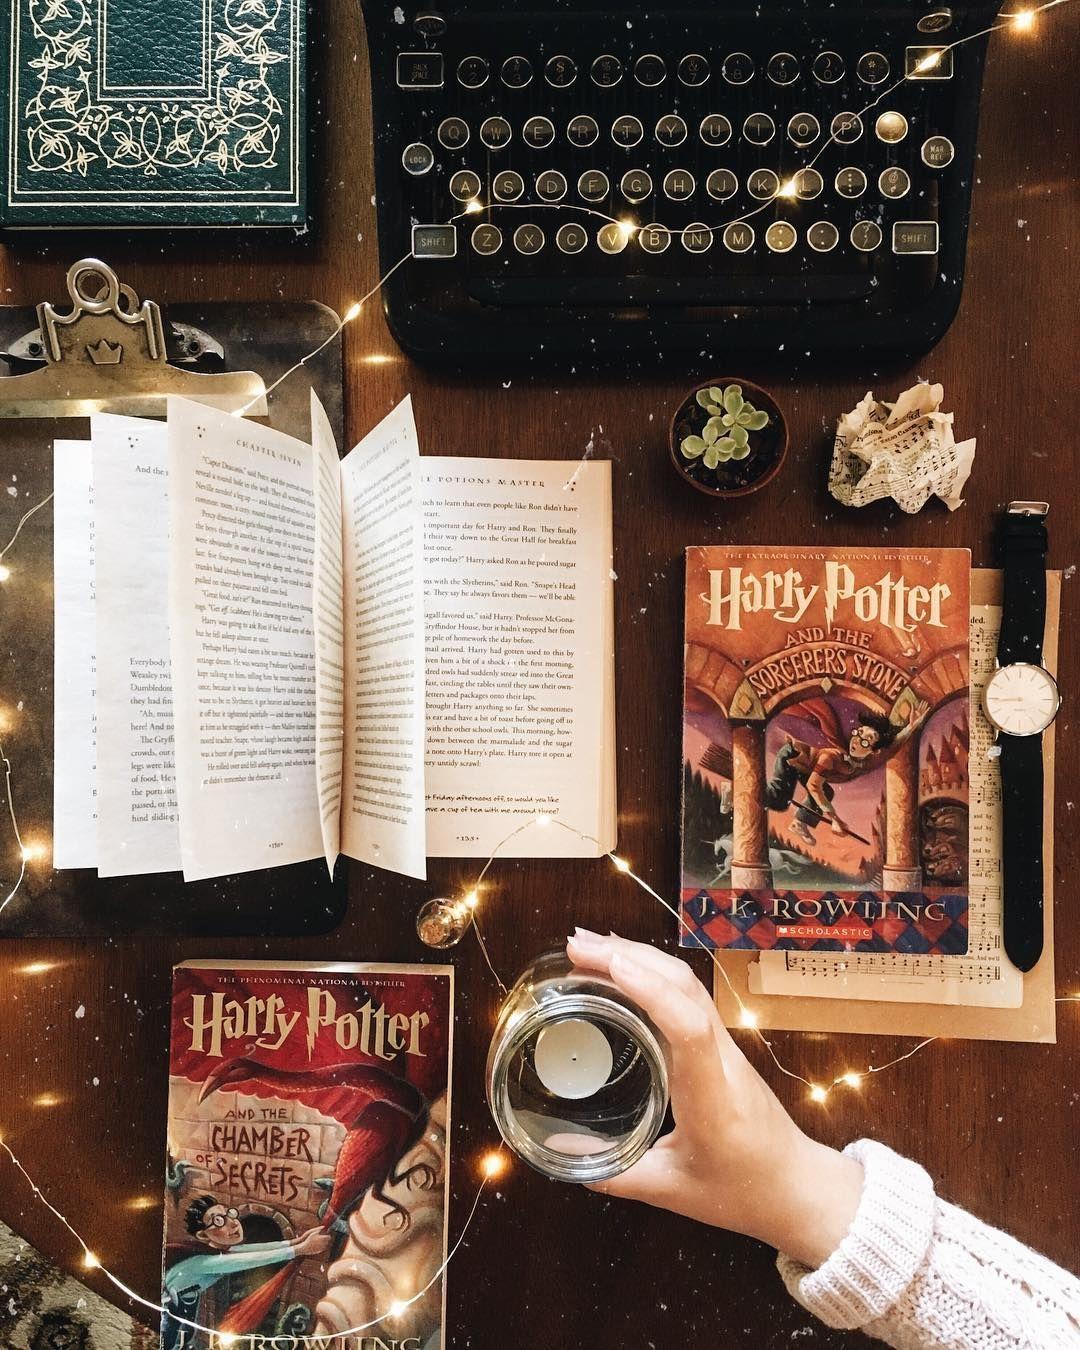 Harrypotterpictures Harry Potter Aesthetic Harry Potter Wallpaper Harry Potter Fanfiction